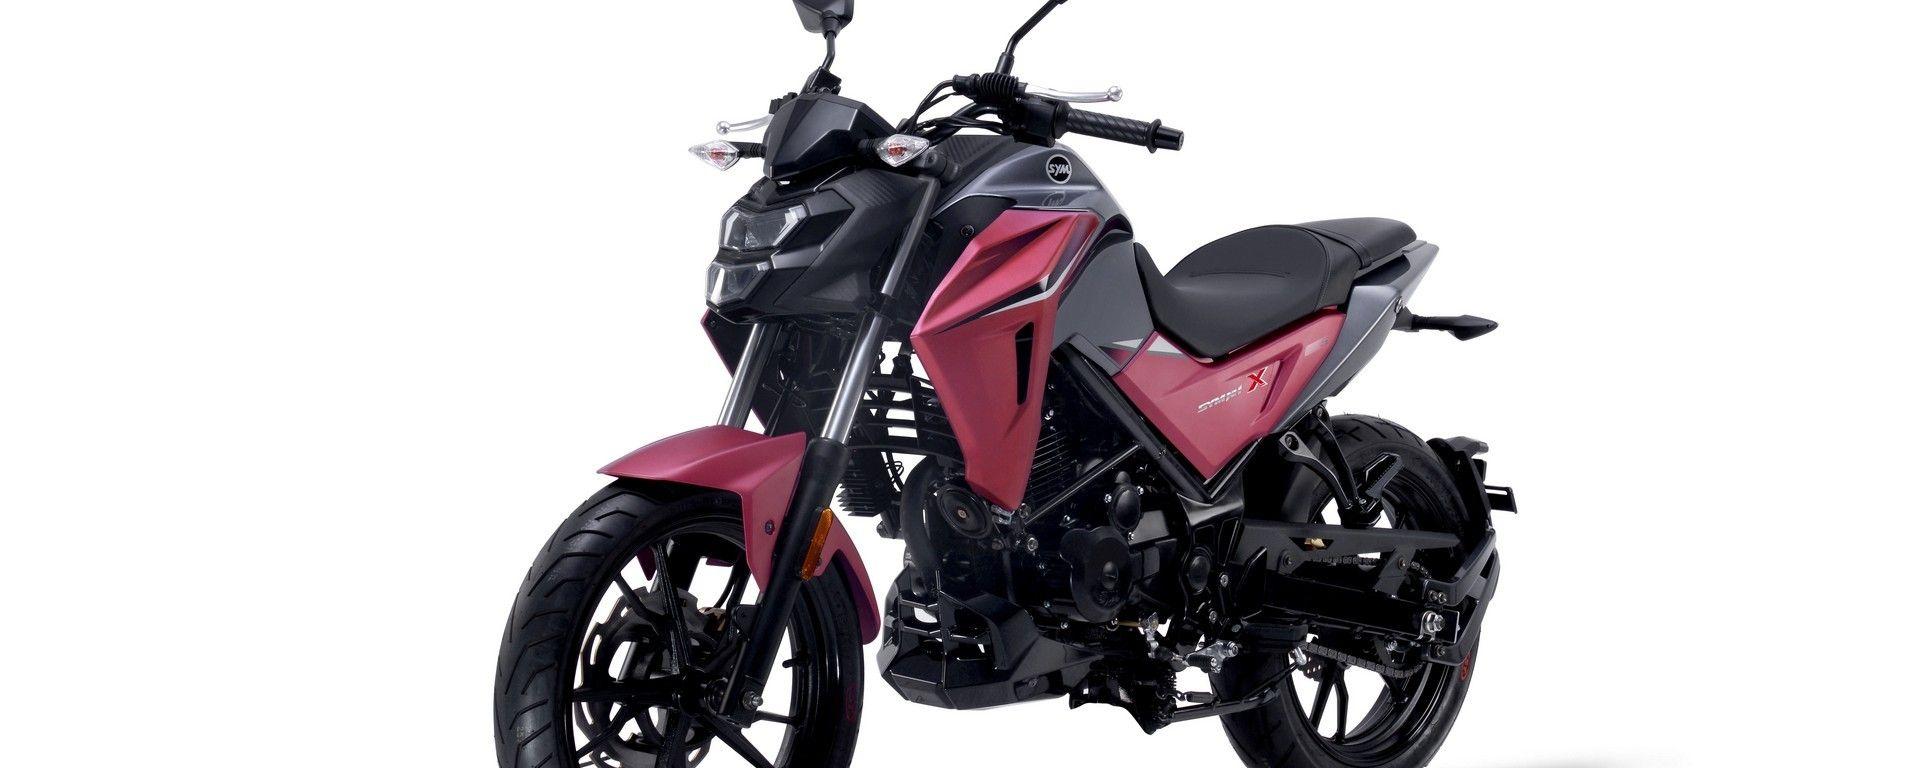 Eicma 2018: Sym lancia la naked 125 cc NH X [VIDEO]